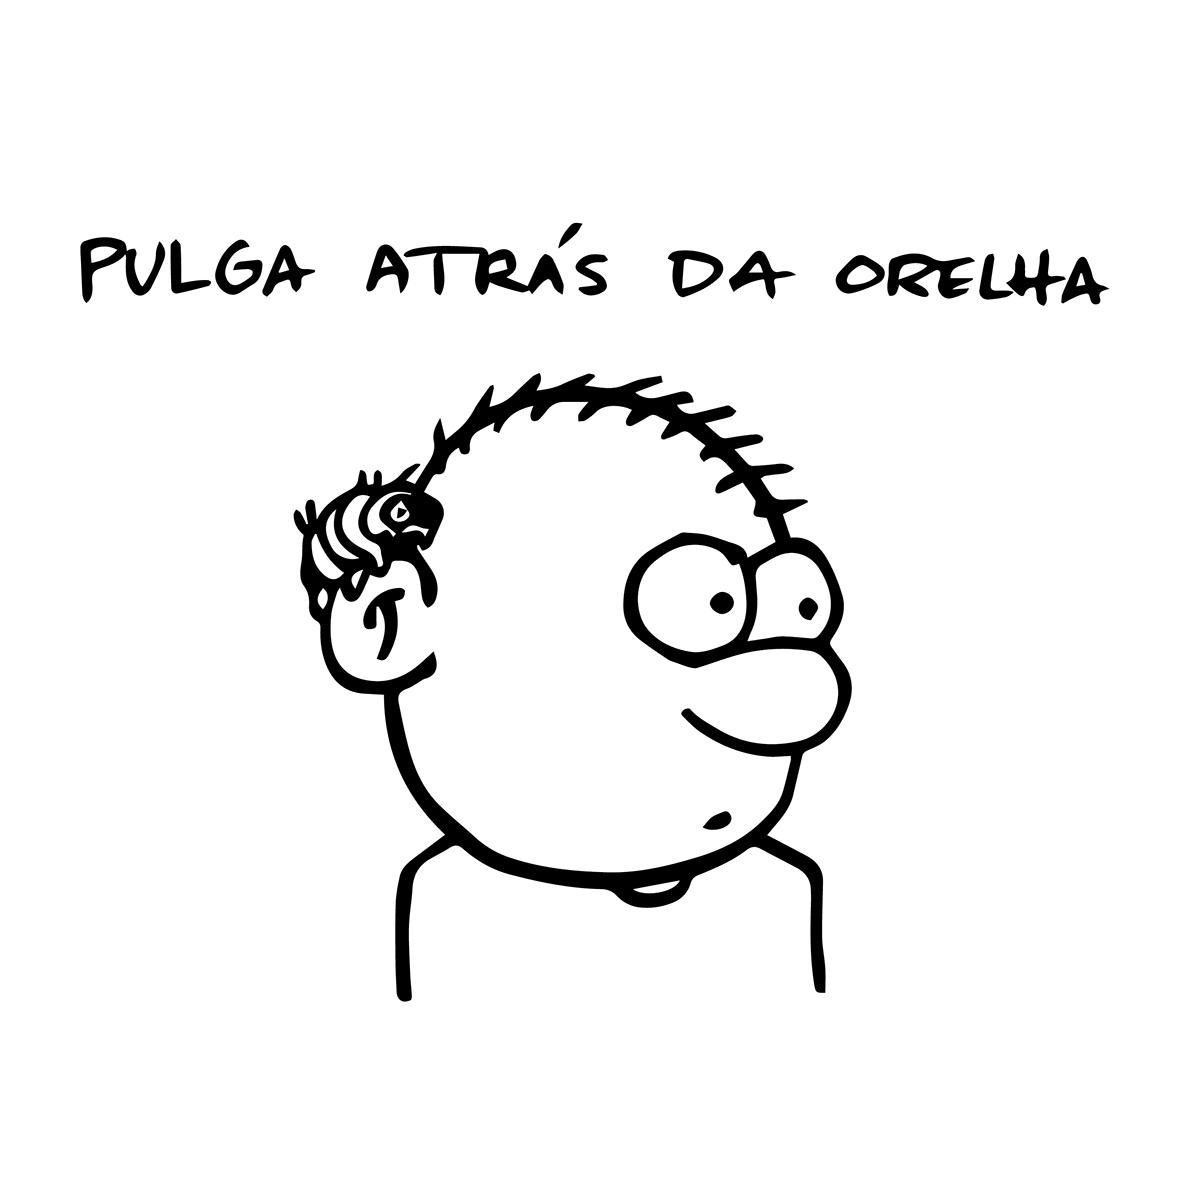 Portuguese sayings Portuguese Culture Provérbios Portugueses ditados portugueses